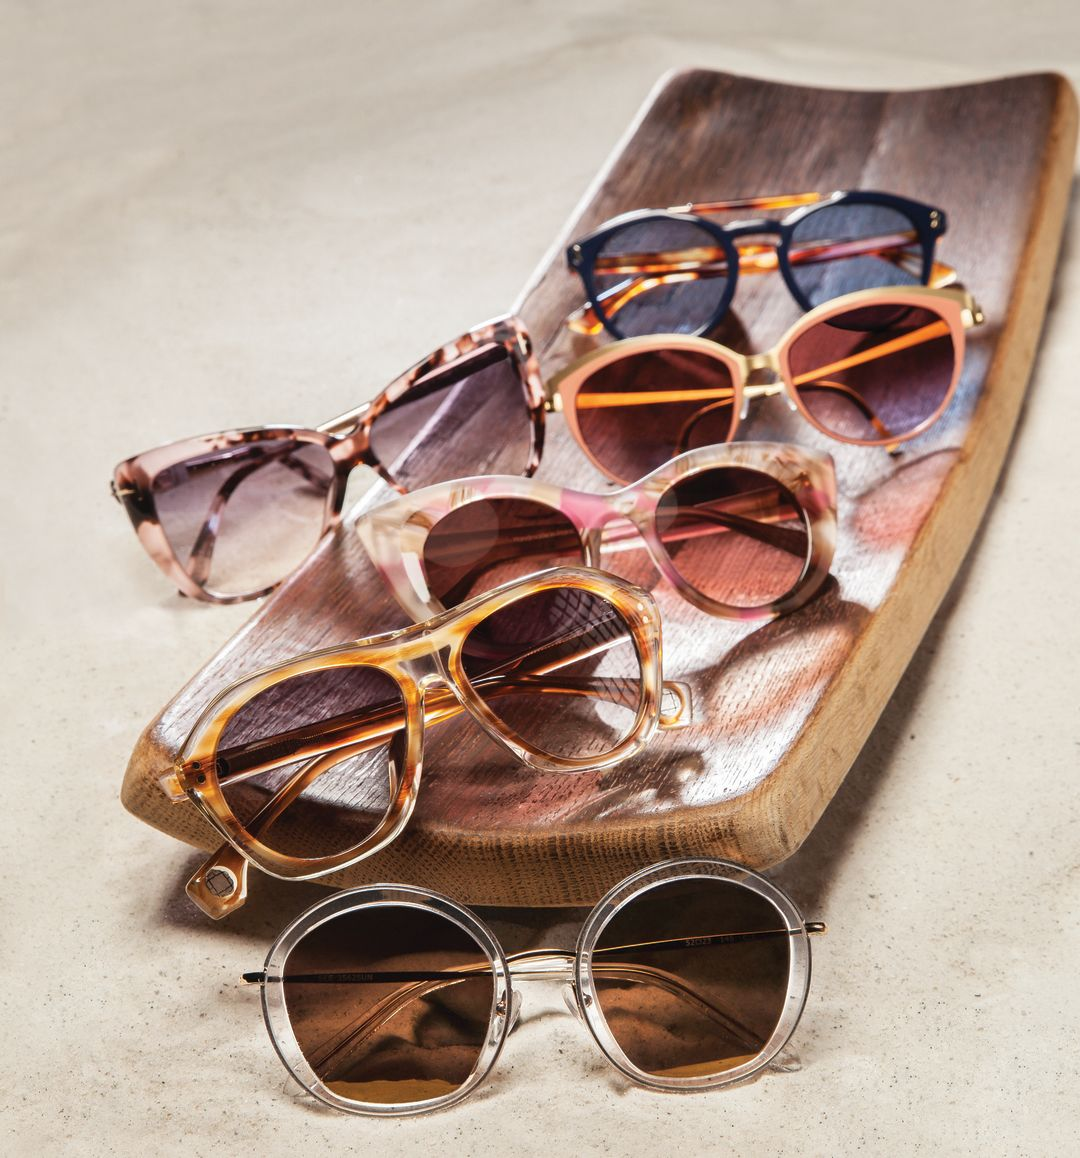 Mhollersra sunglassesdec2017 01 wzcuha